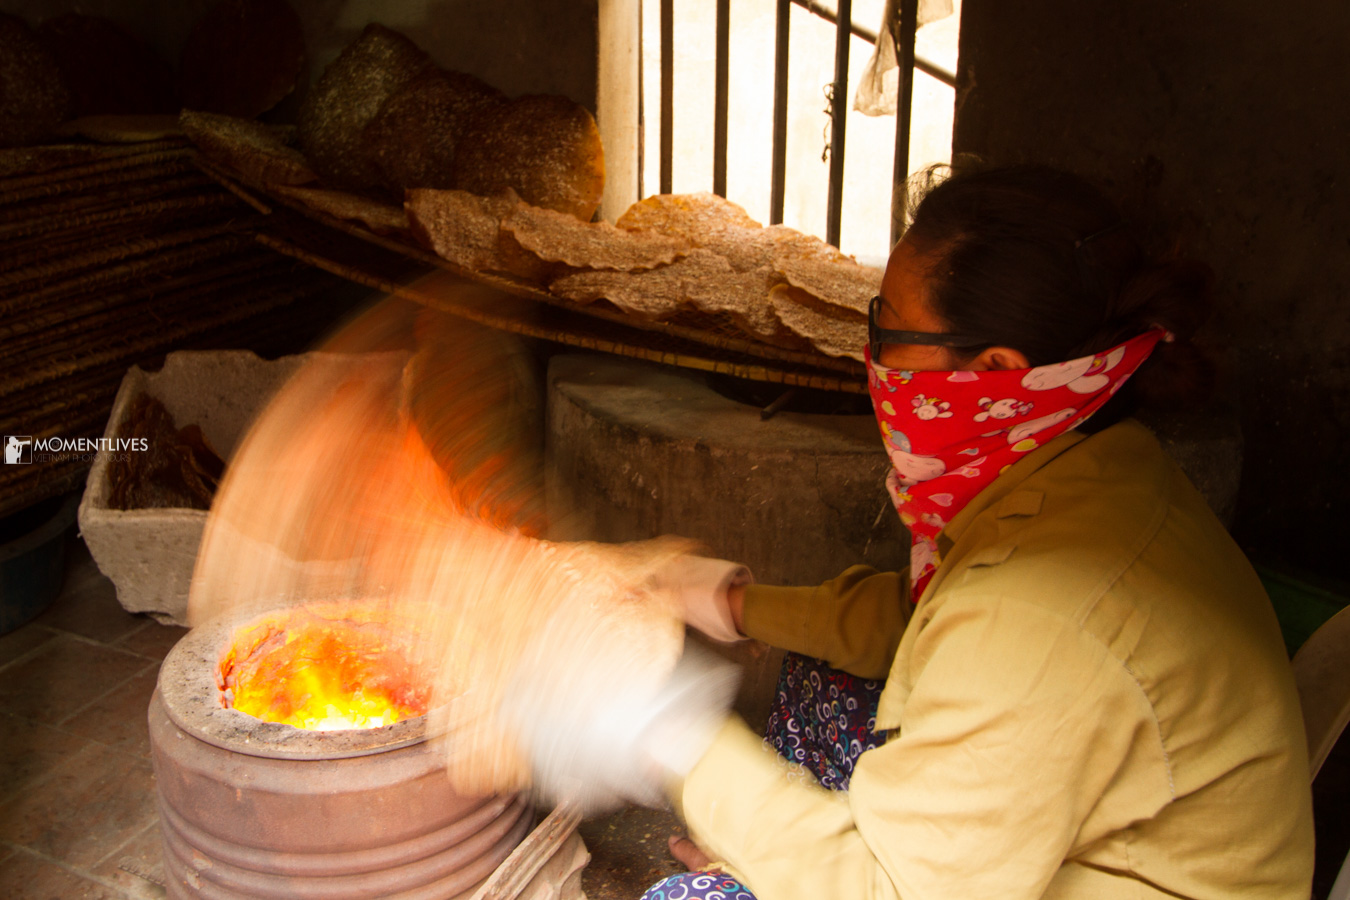 Lady drying rice cracker